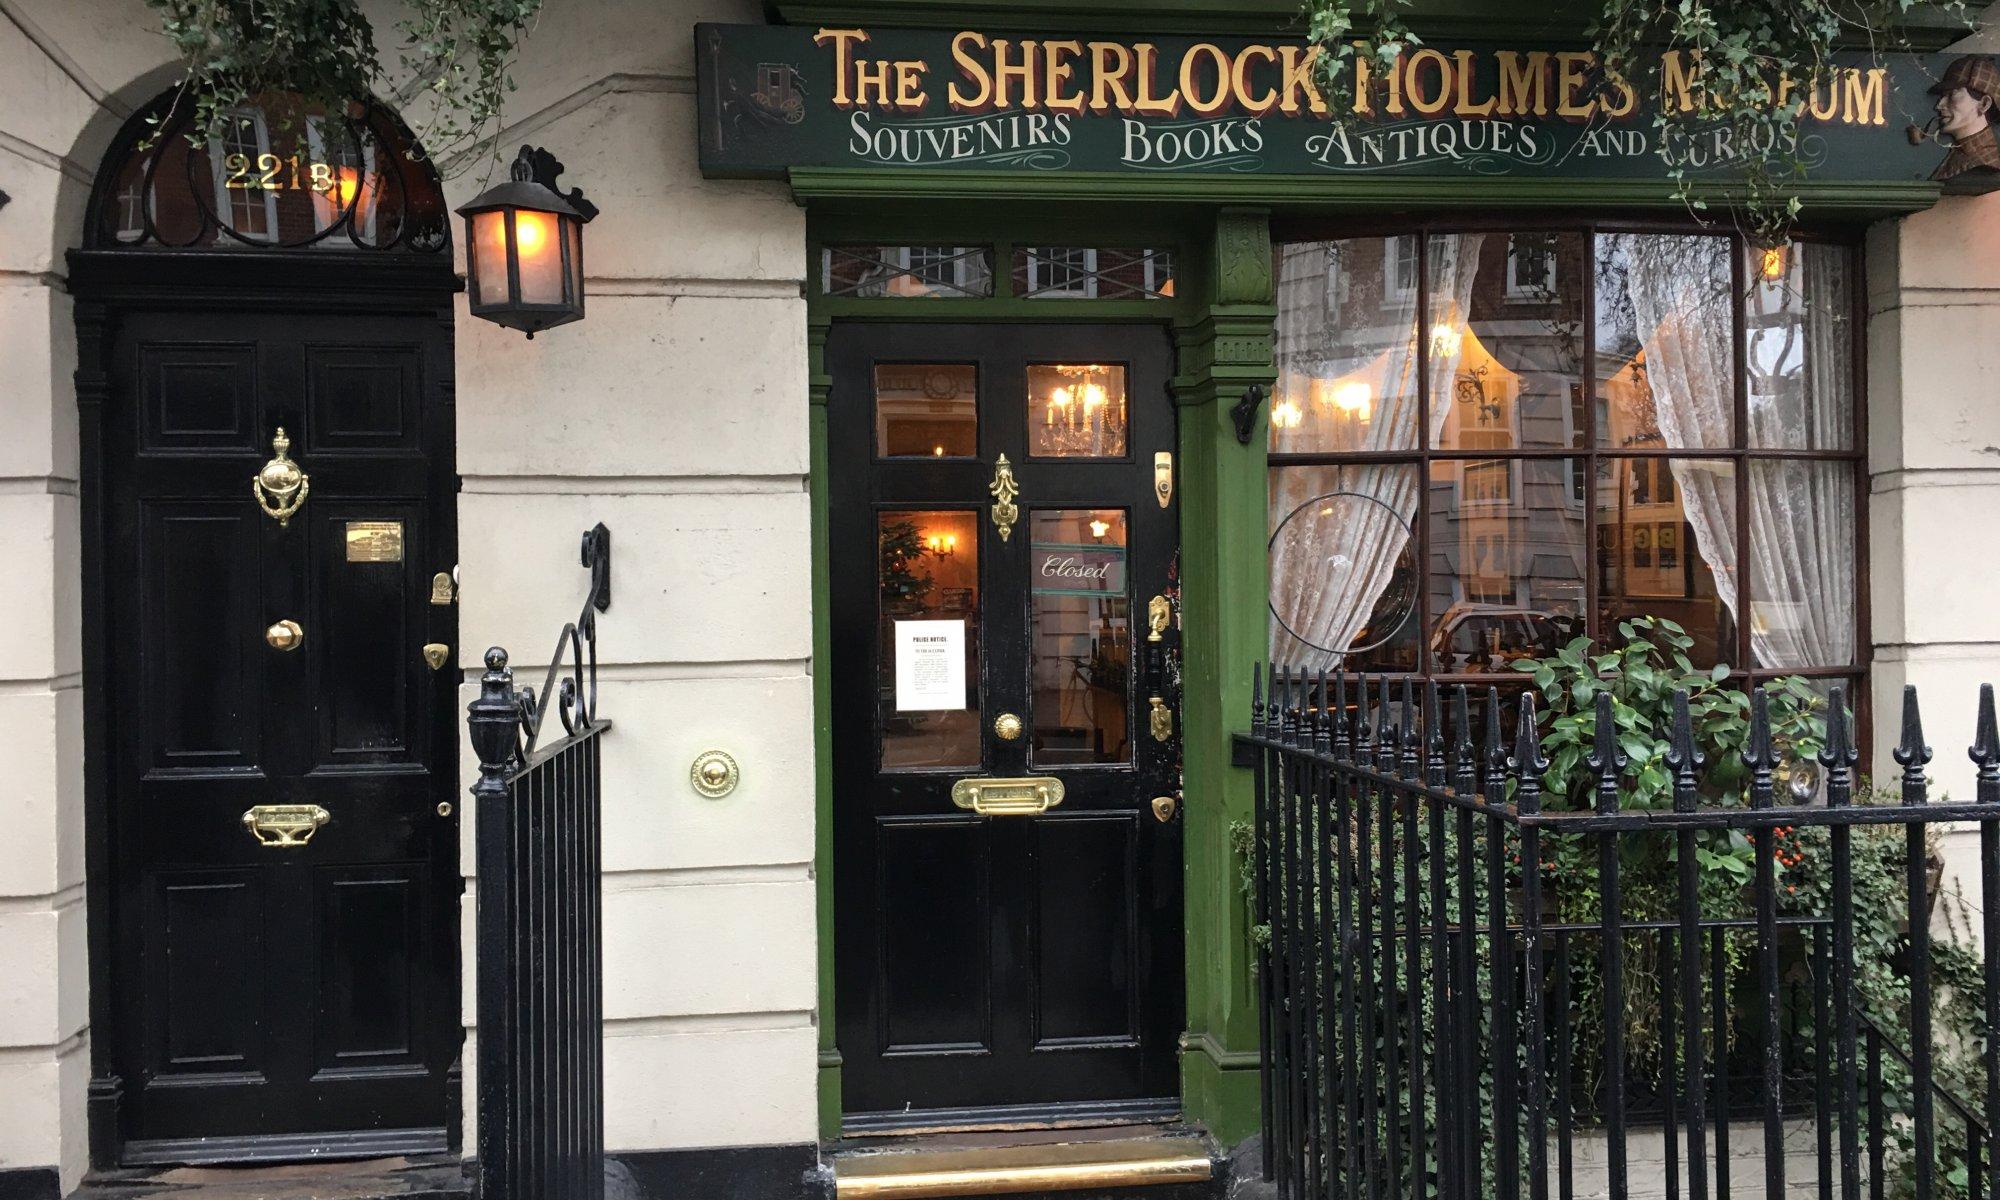 Baker street, London, England